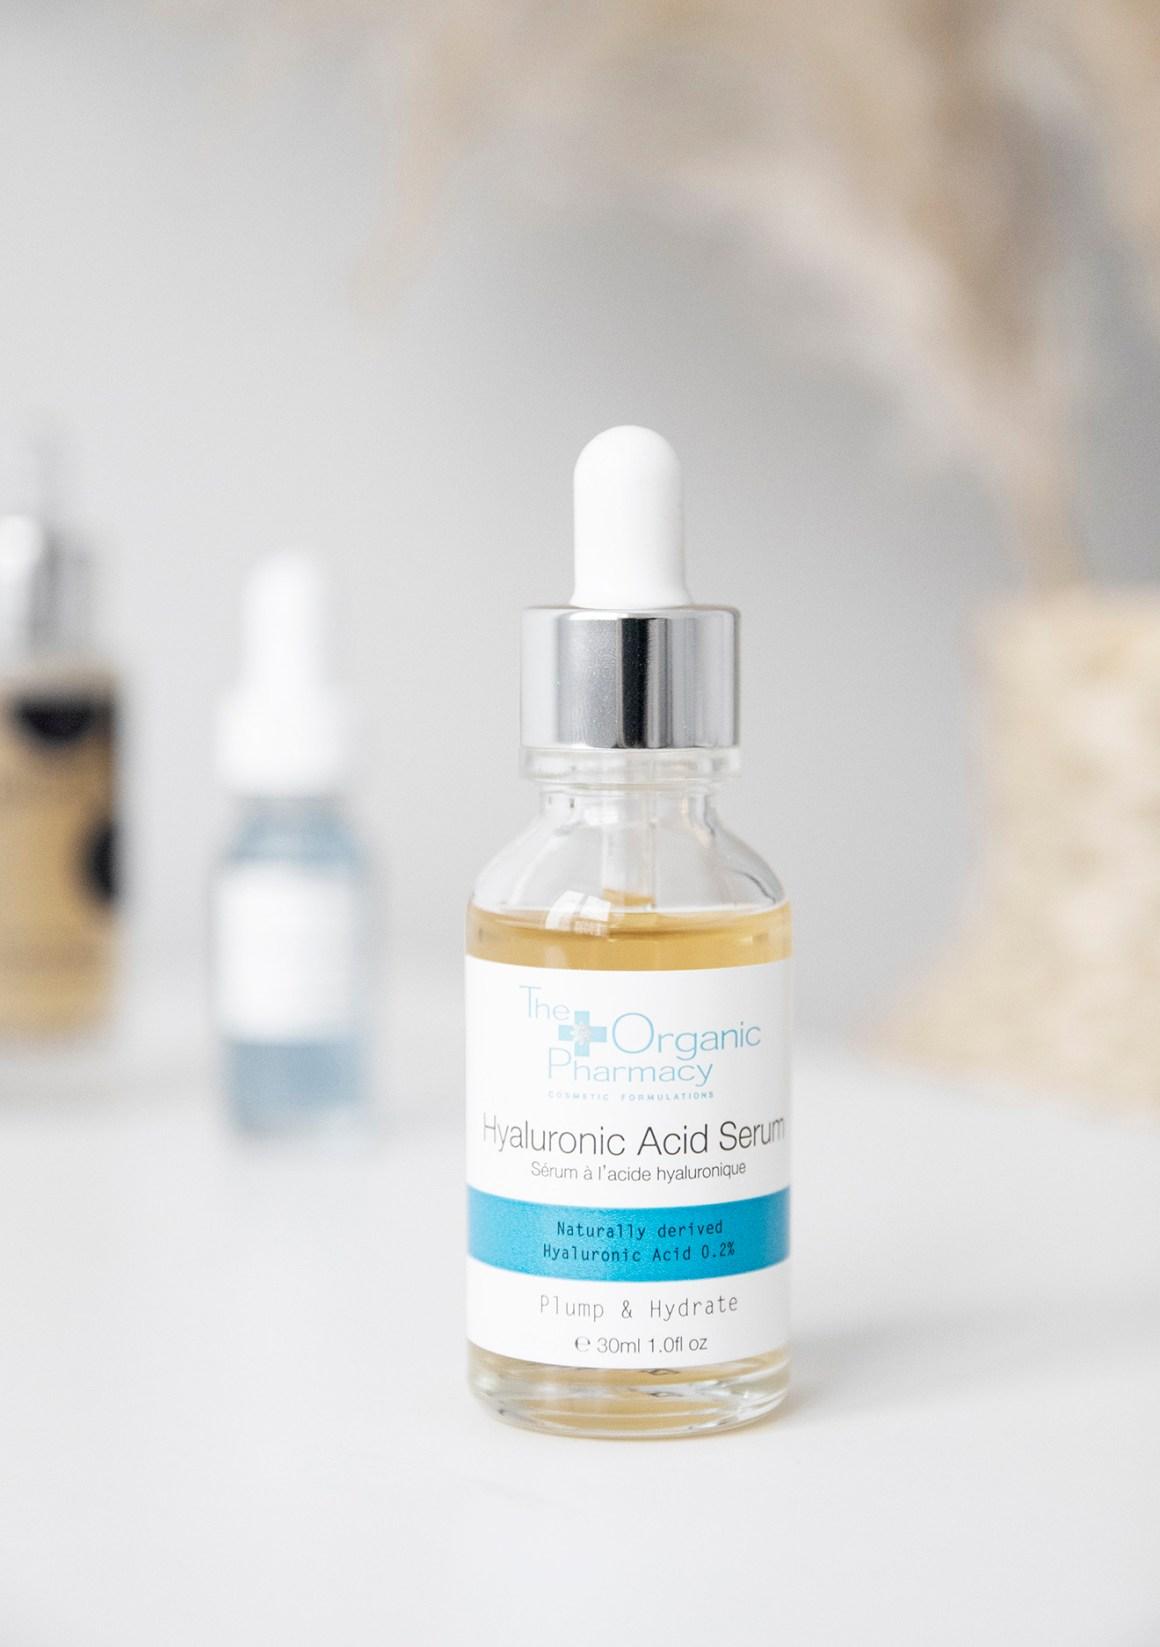 The Organic Pharmacy Natural Hyaluronic Acid Serum